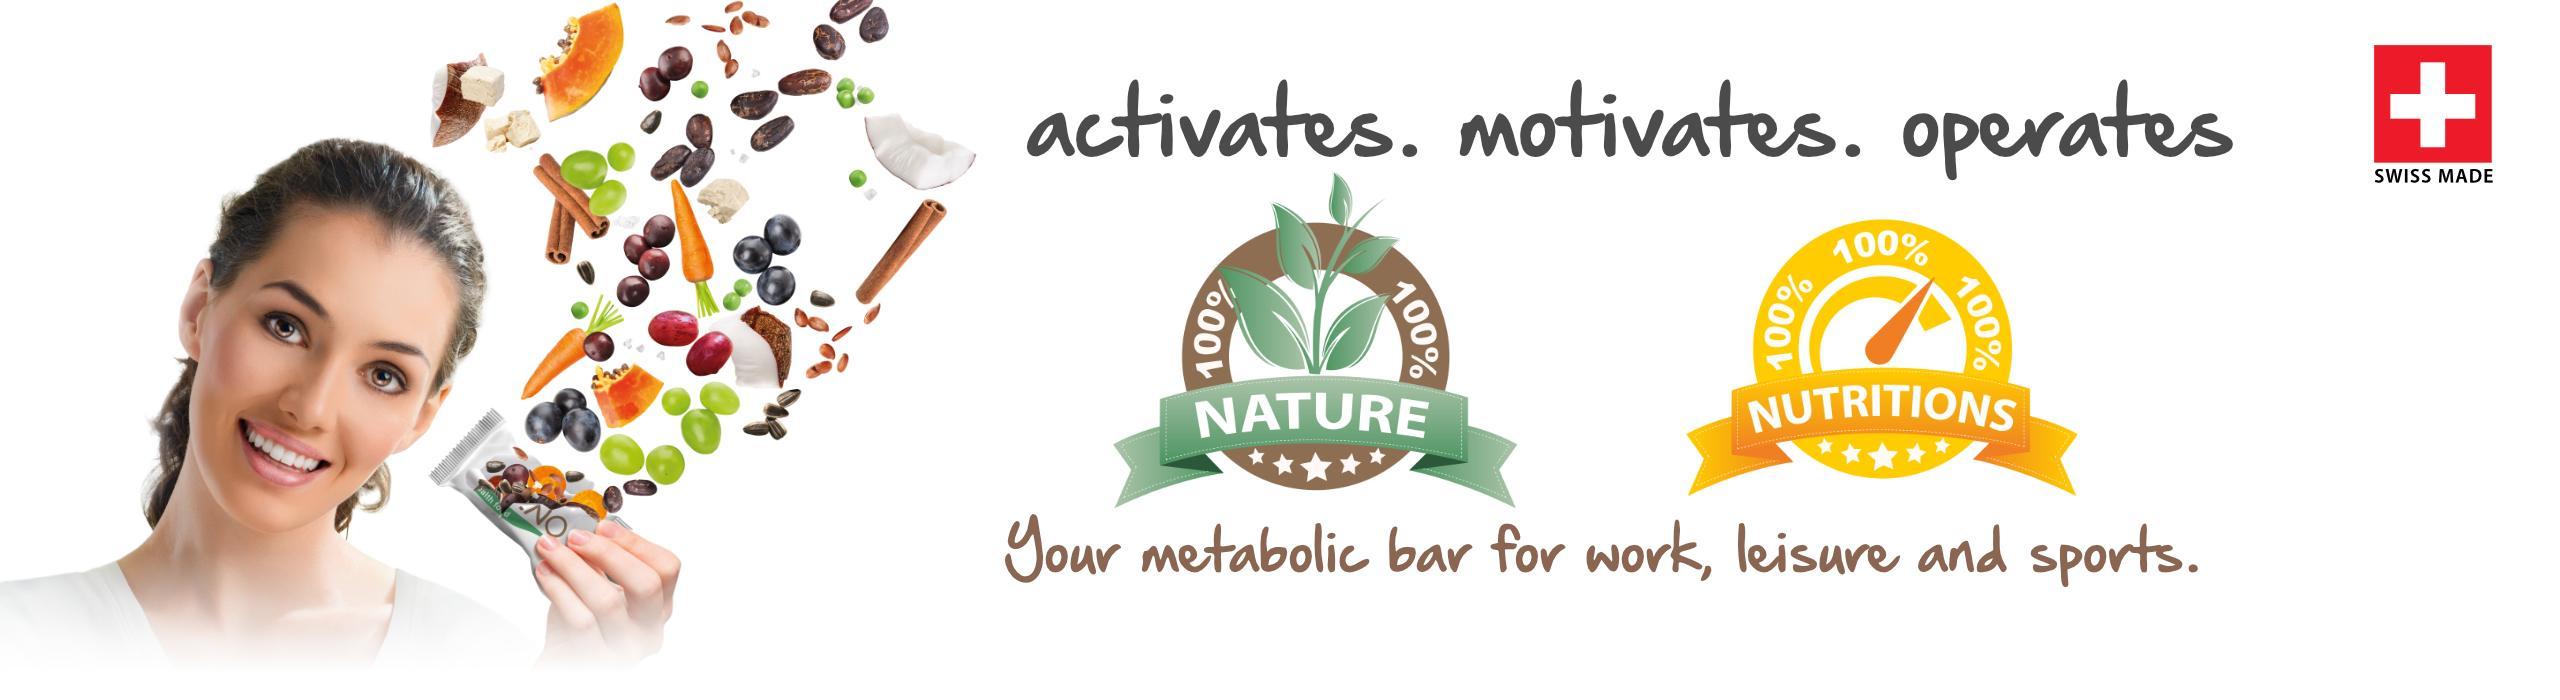 Aktivates-Motivates-Operates